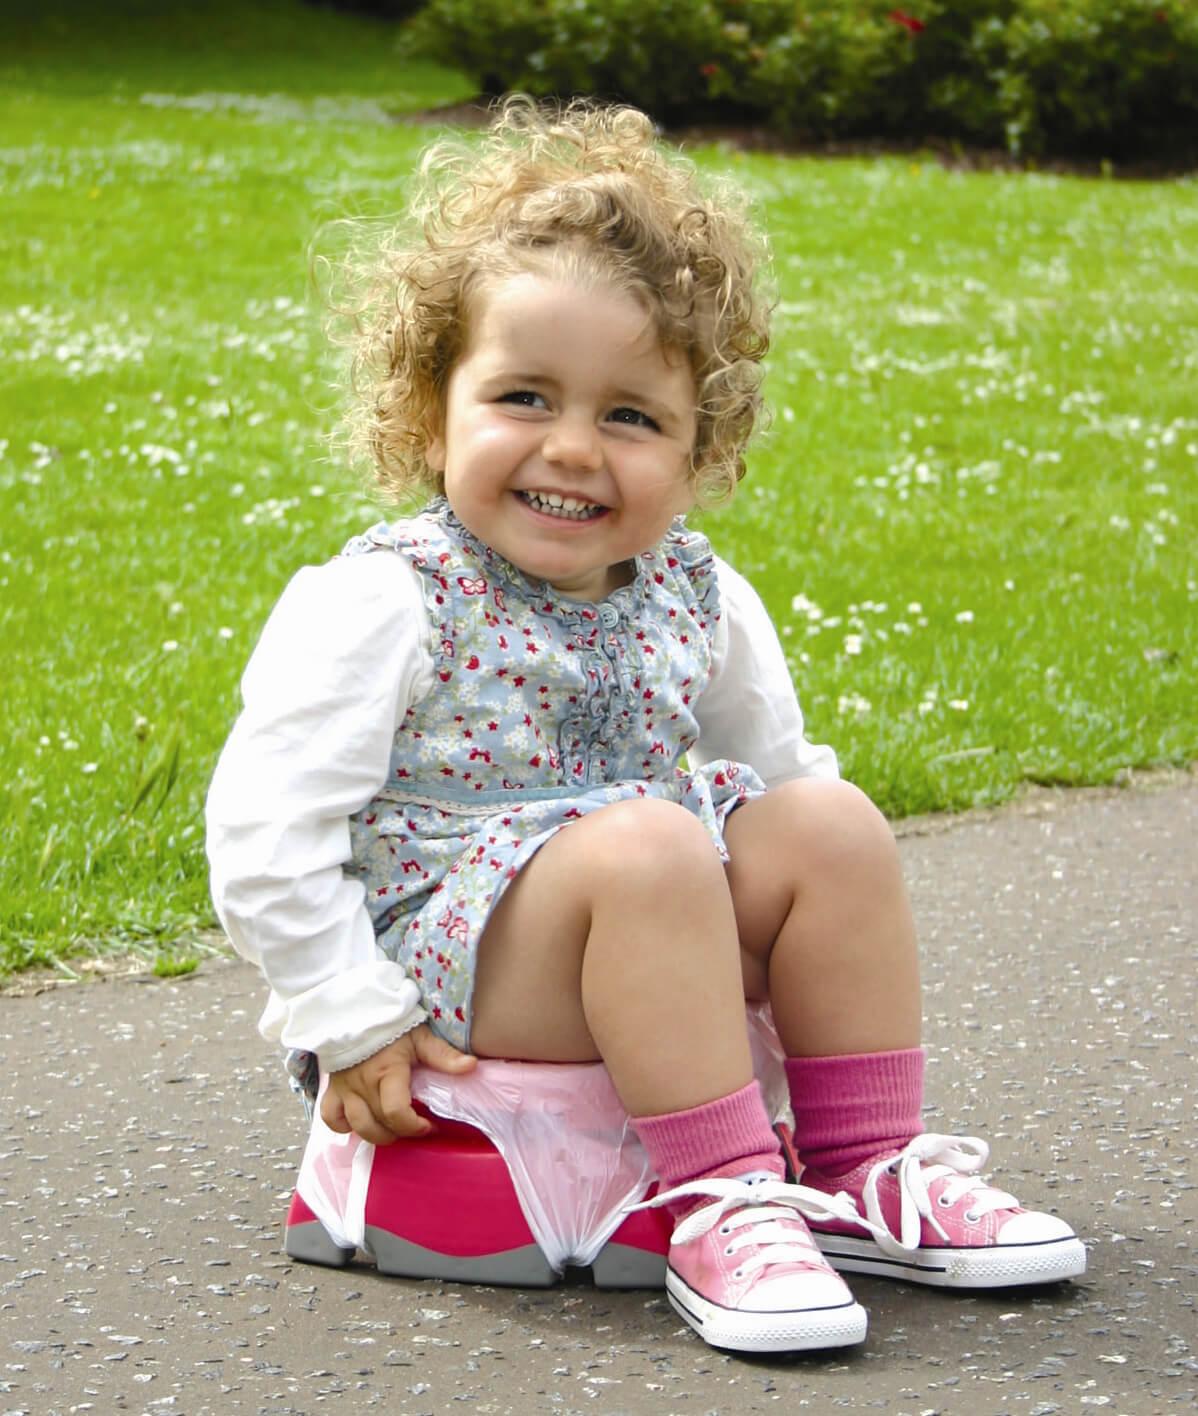 Общий анализ мочи ребенка: расшифровка и норма показателей